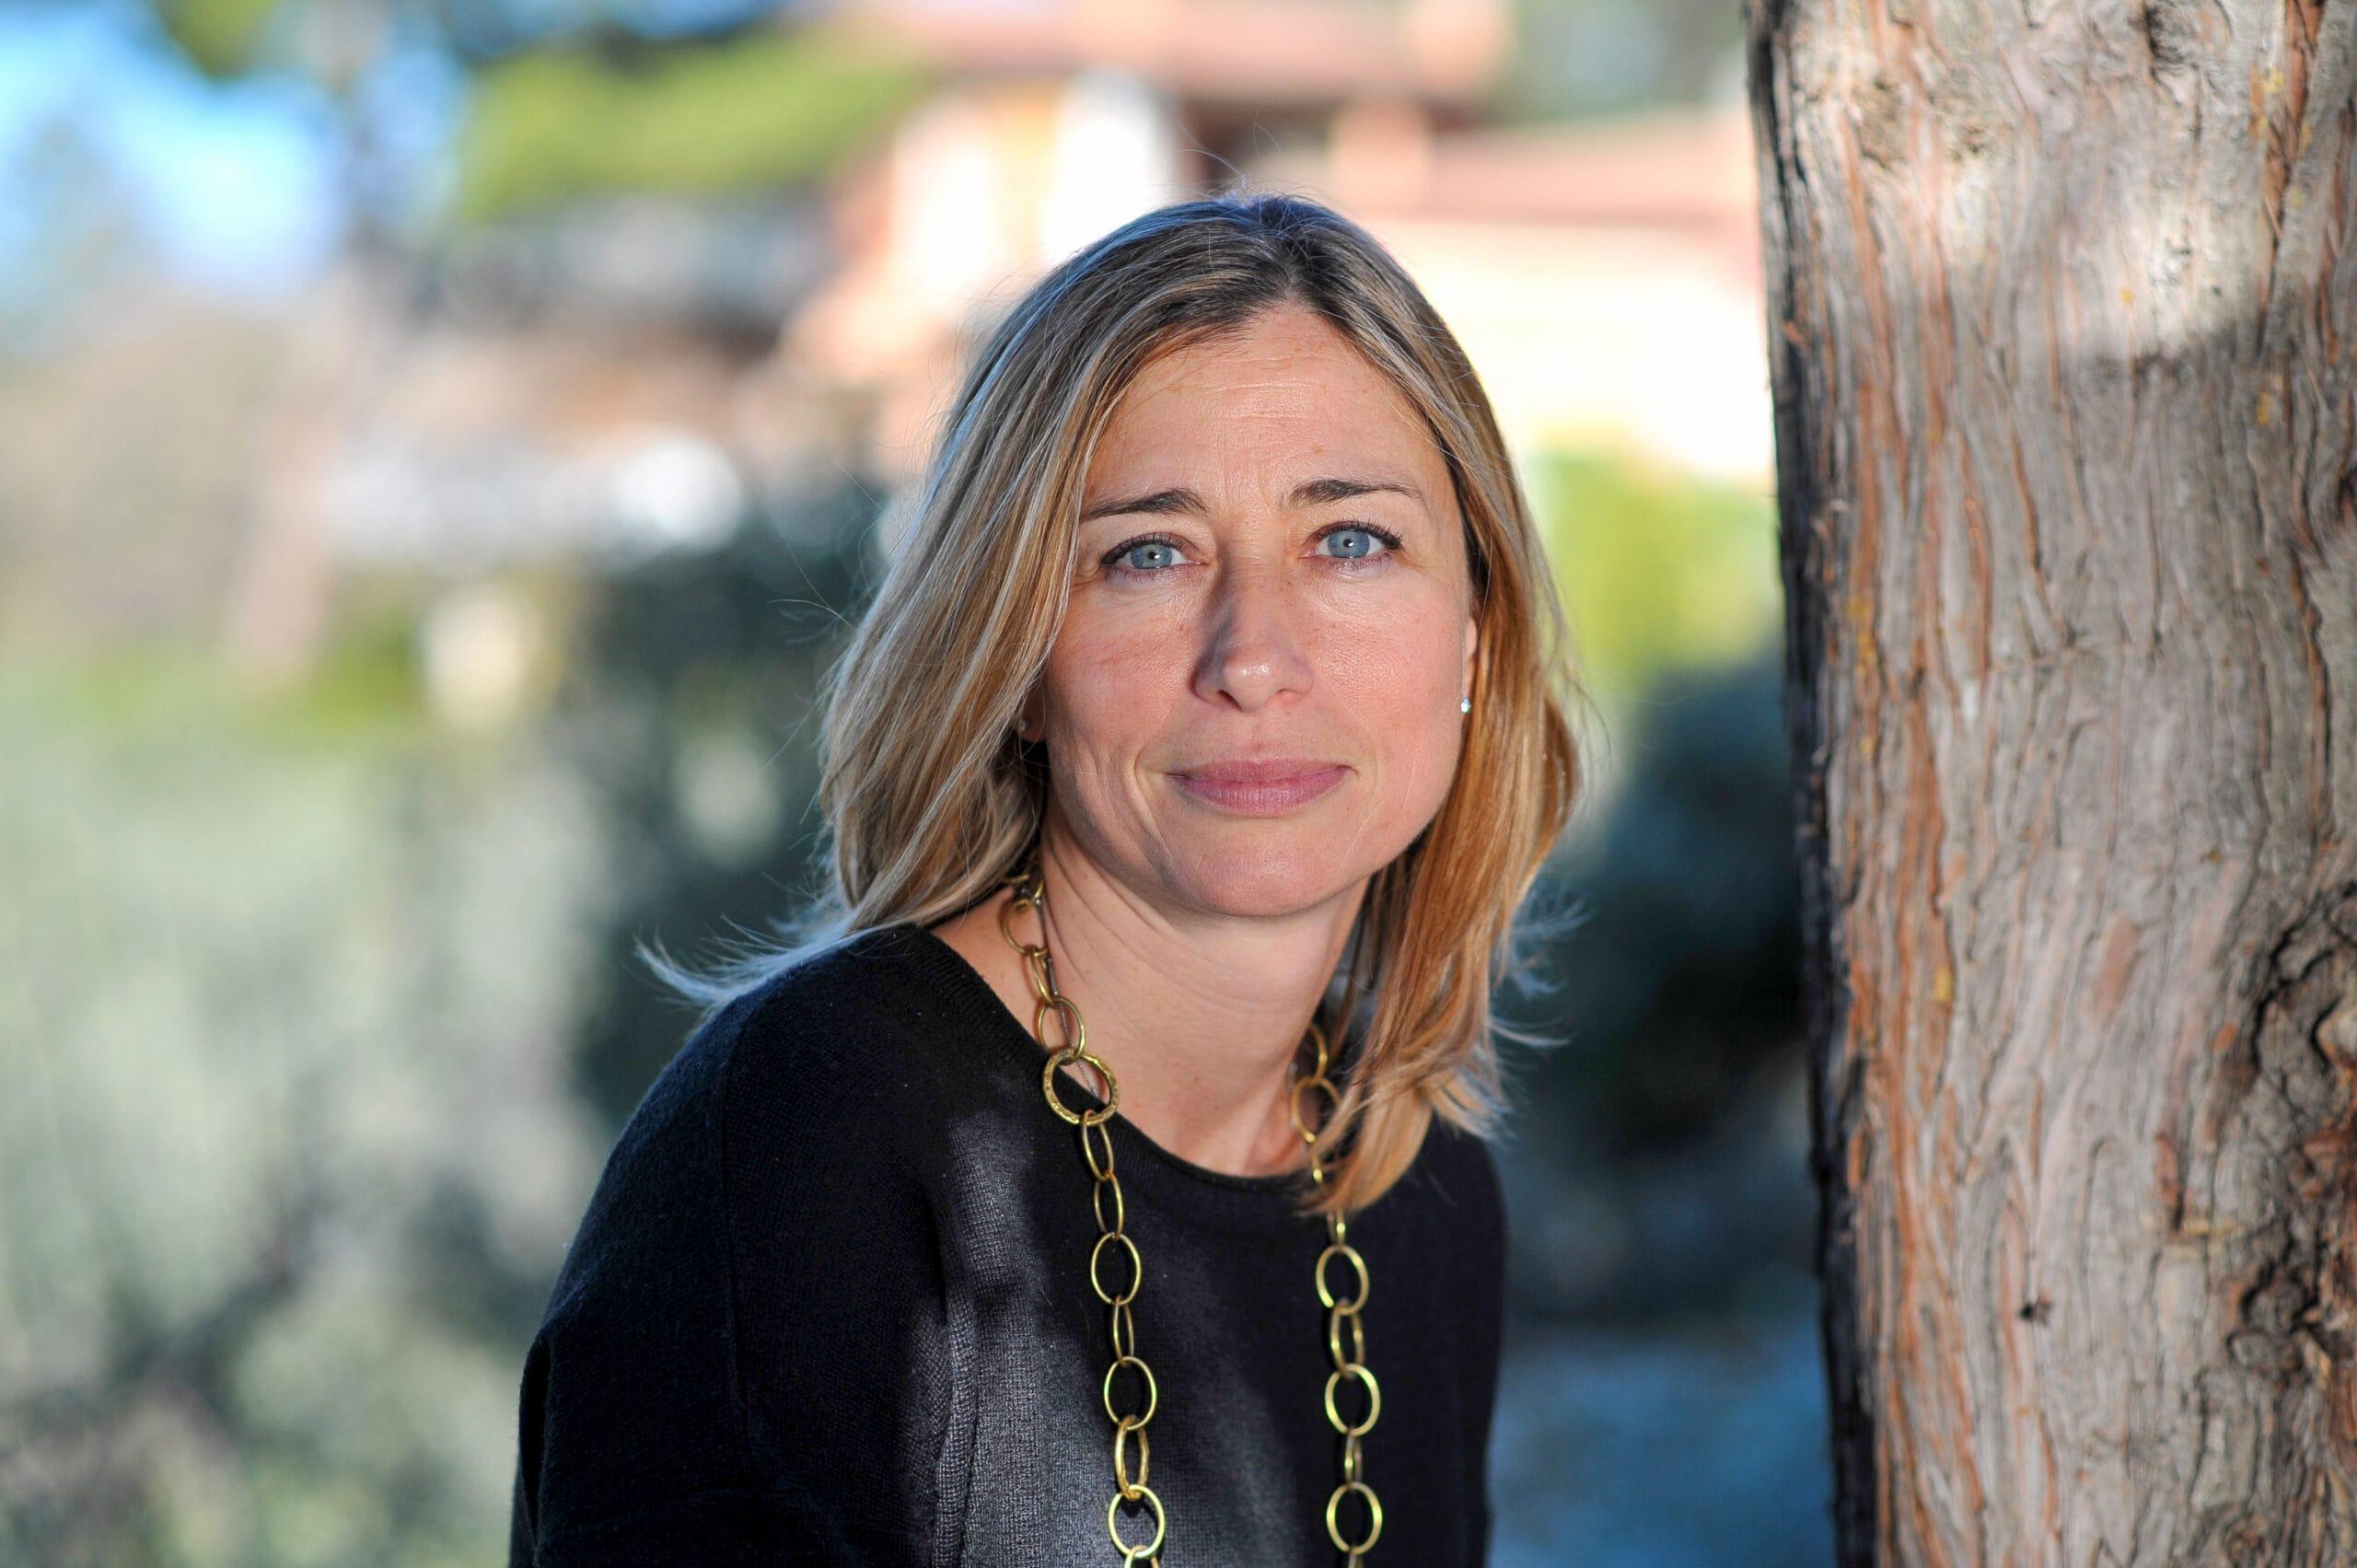 Susanna Finardi